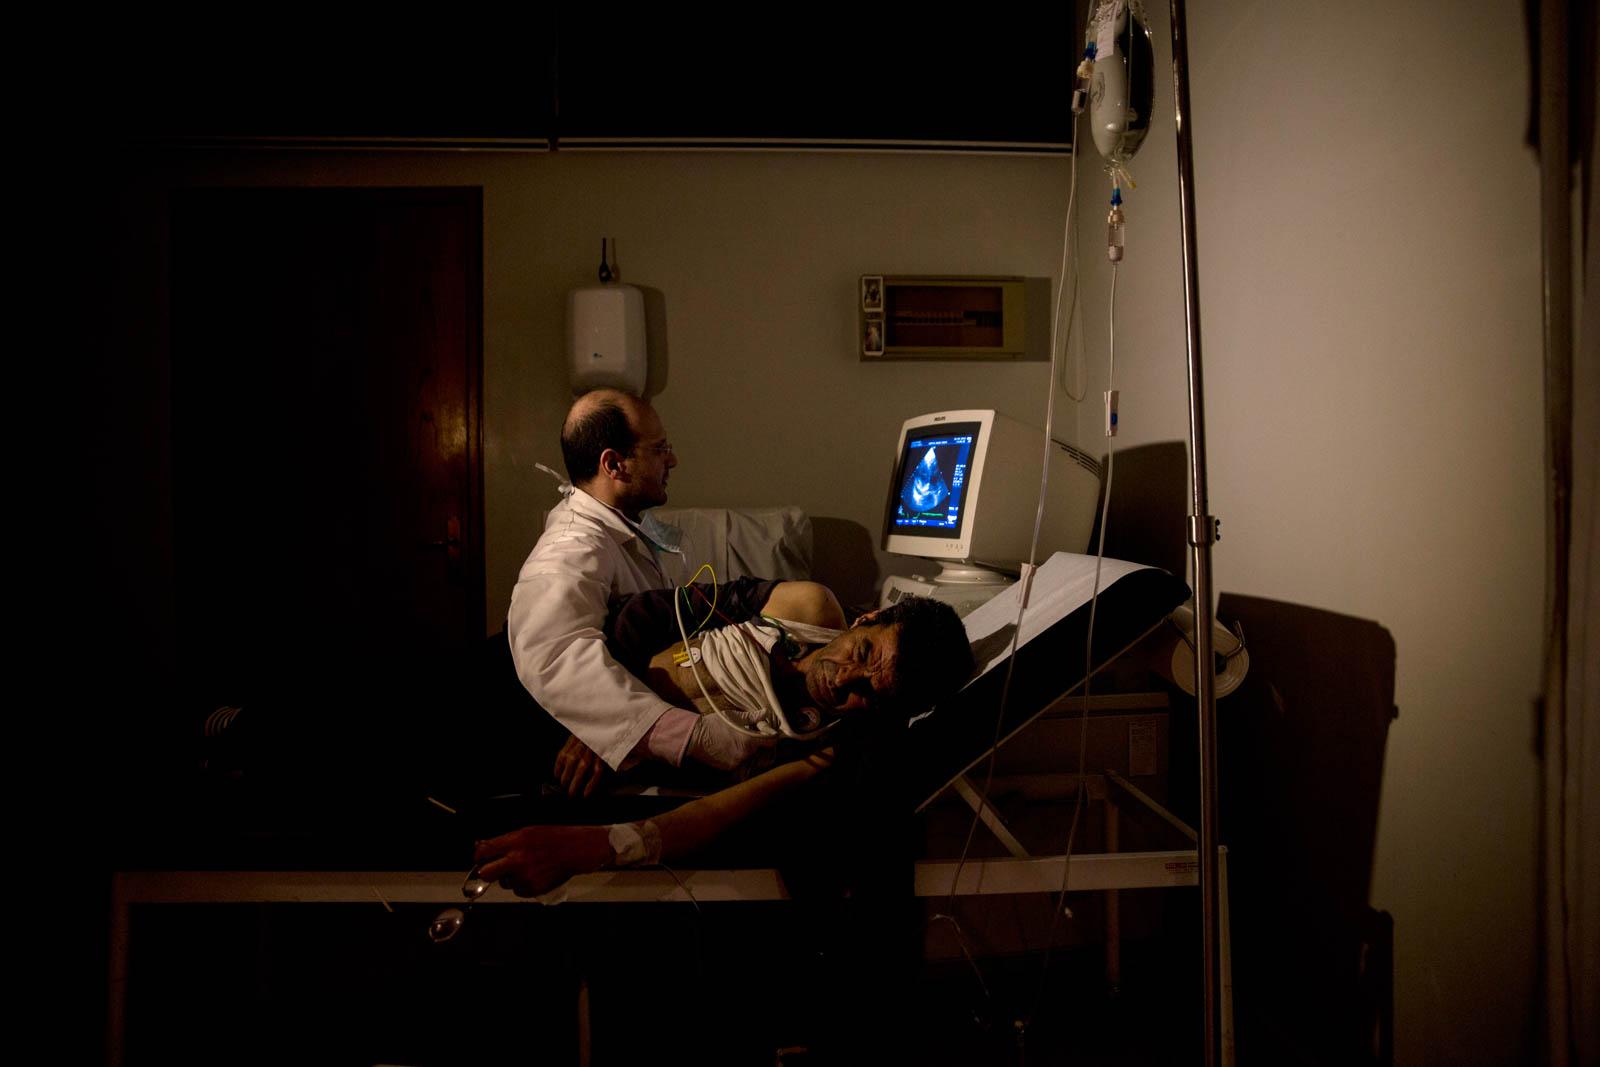 Мужчина проходит медицинское обследование (Ливан) (© AP Images)